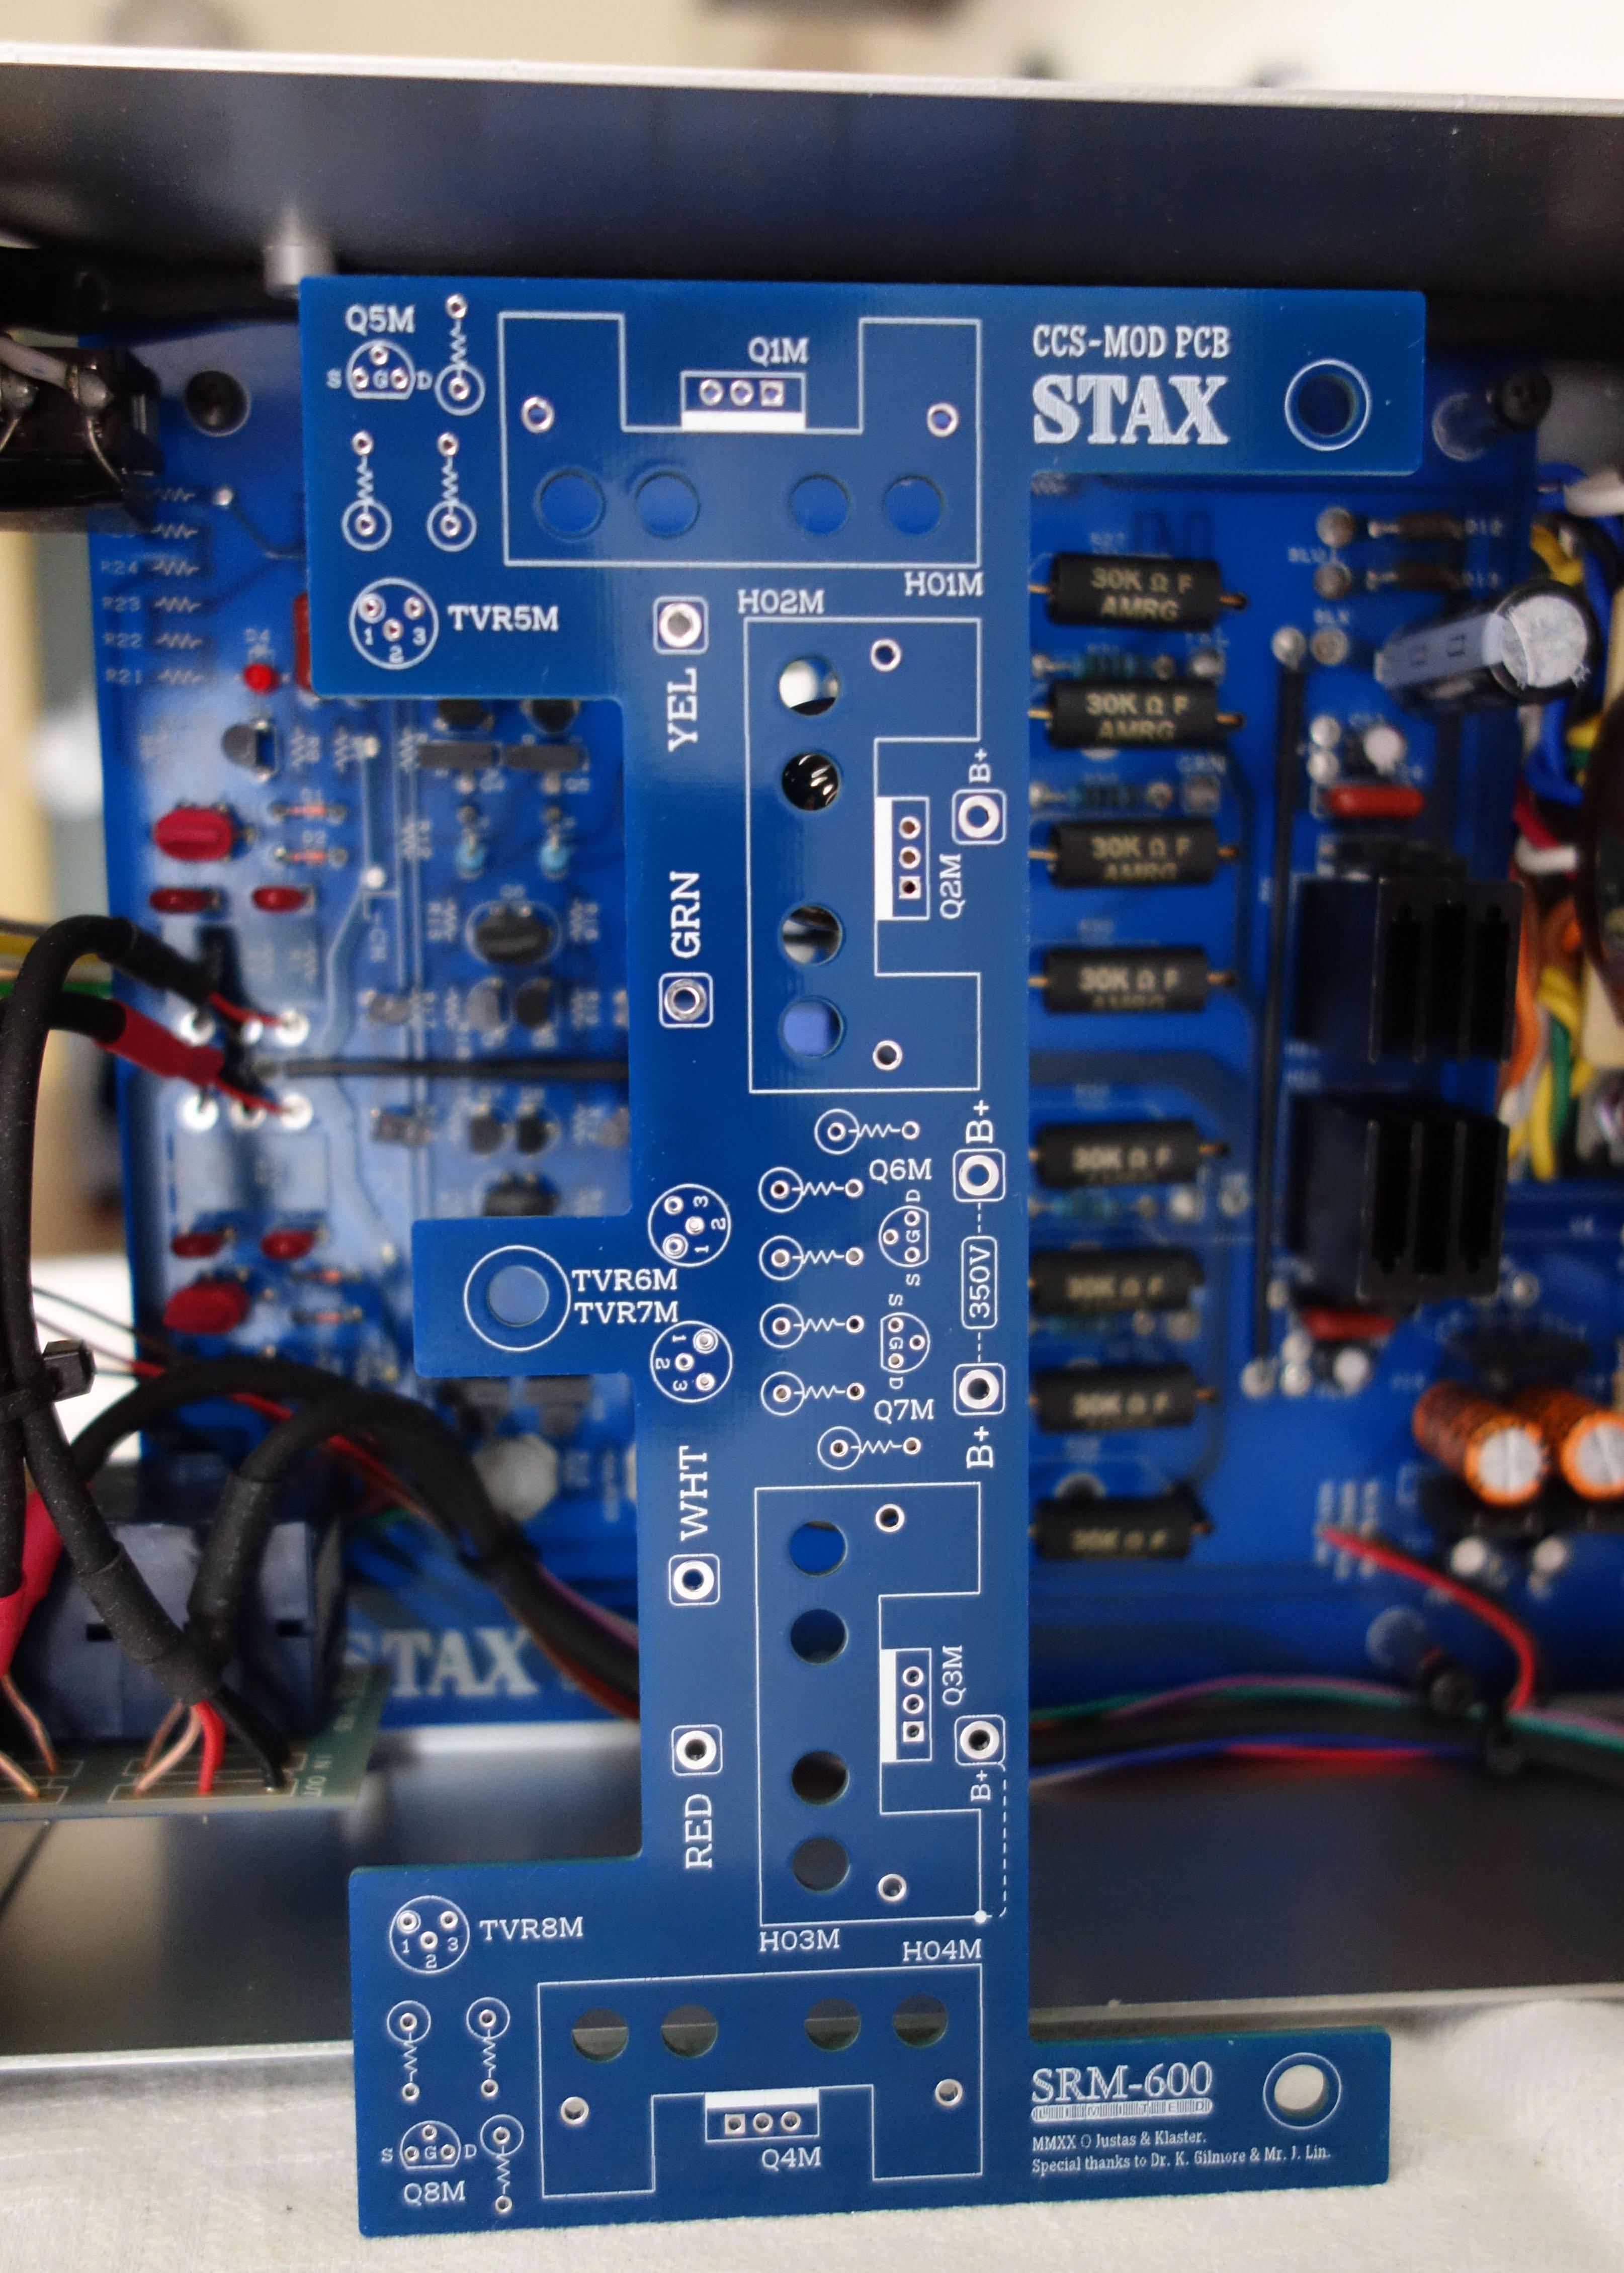 DSC03655-2.JPG